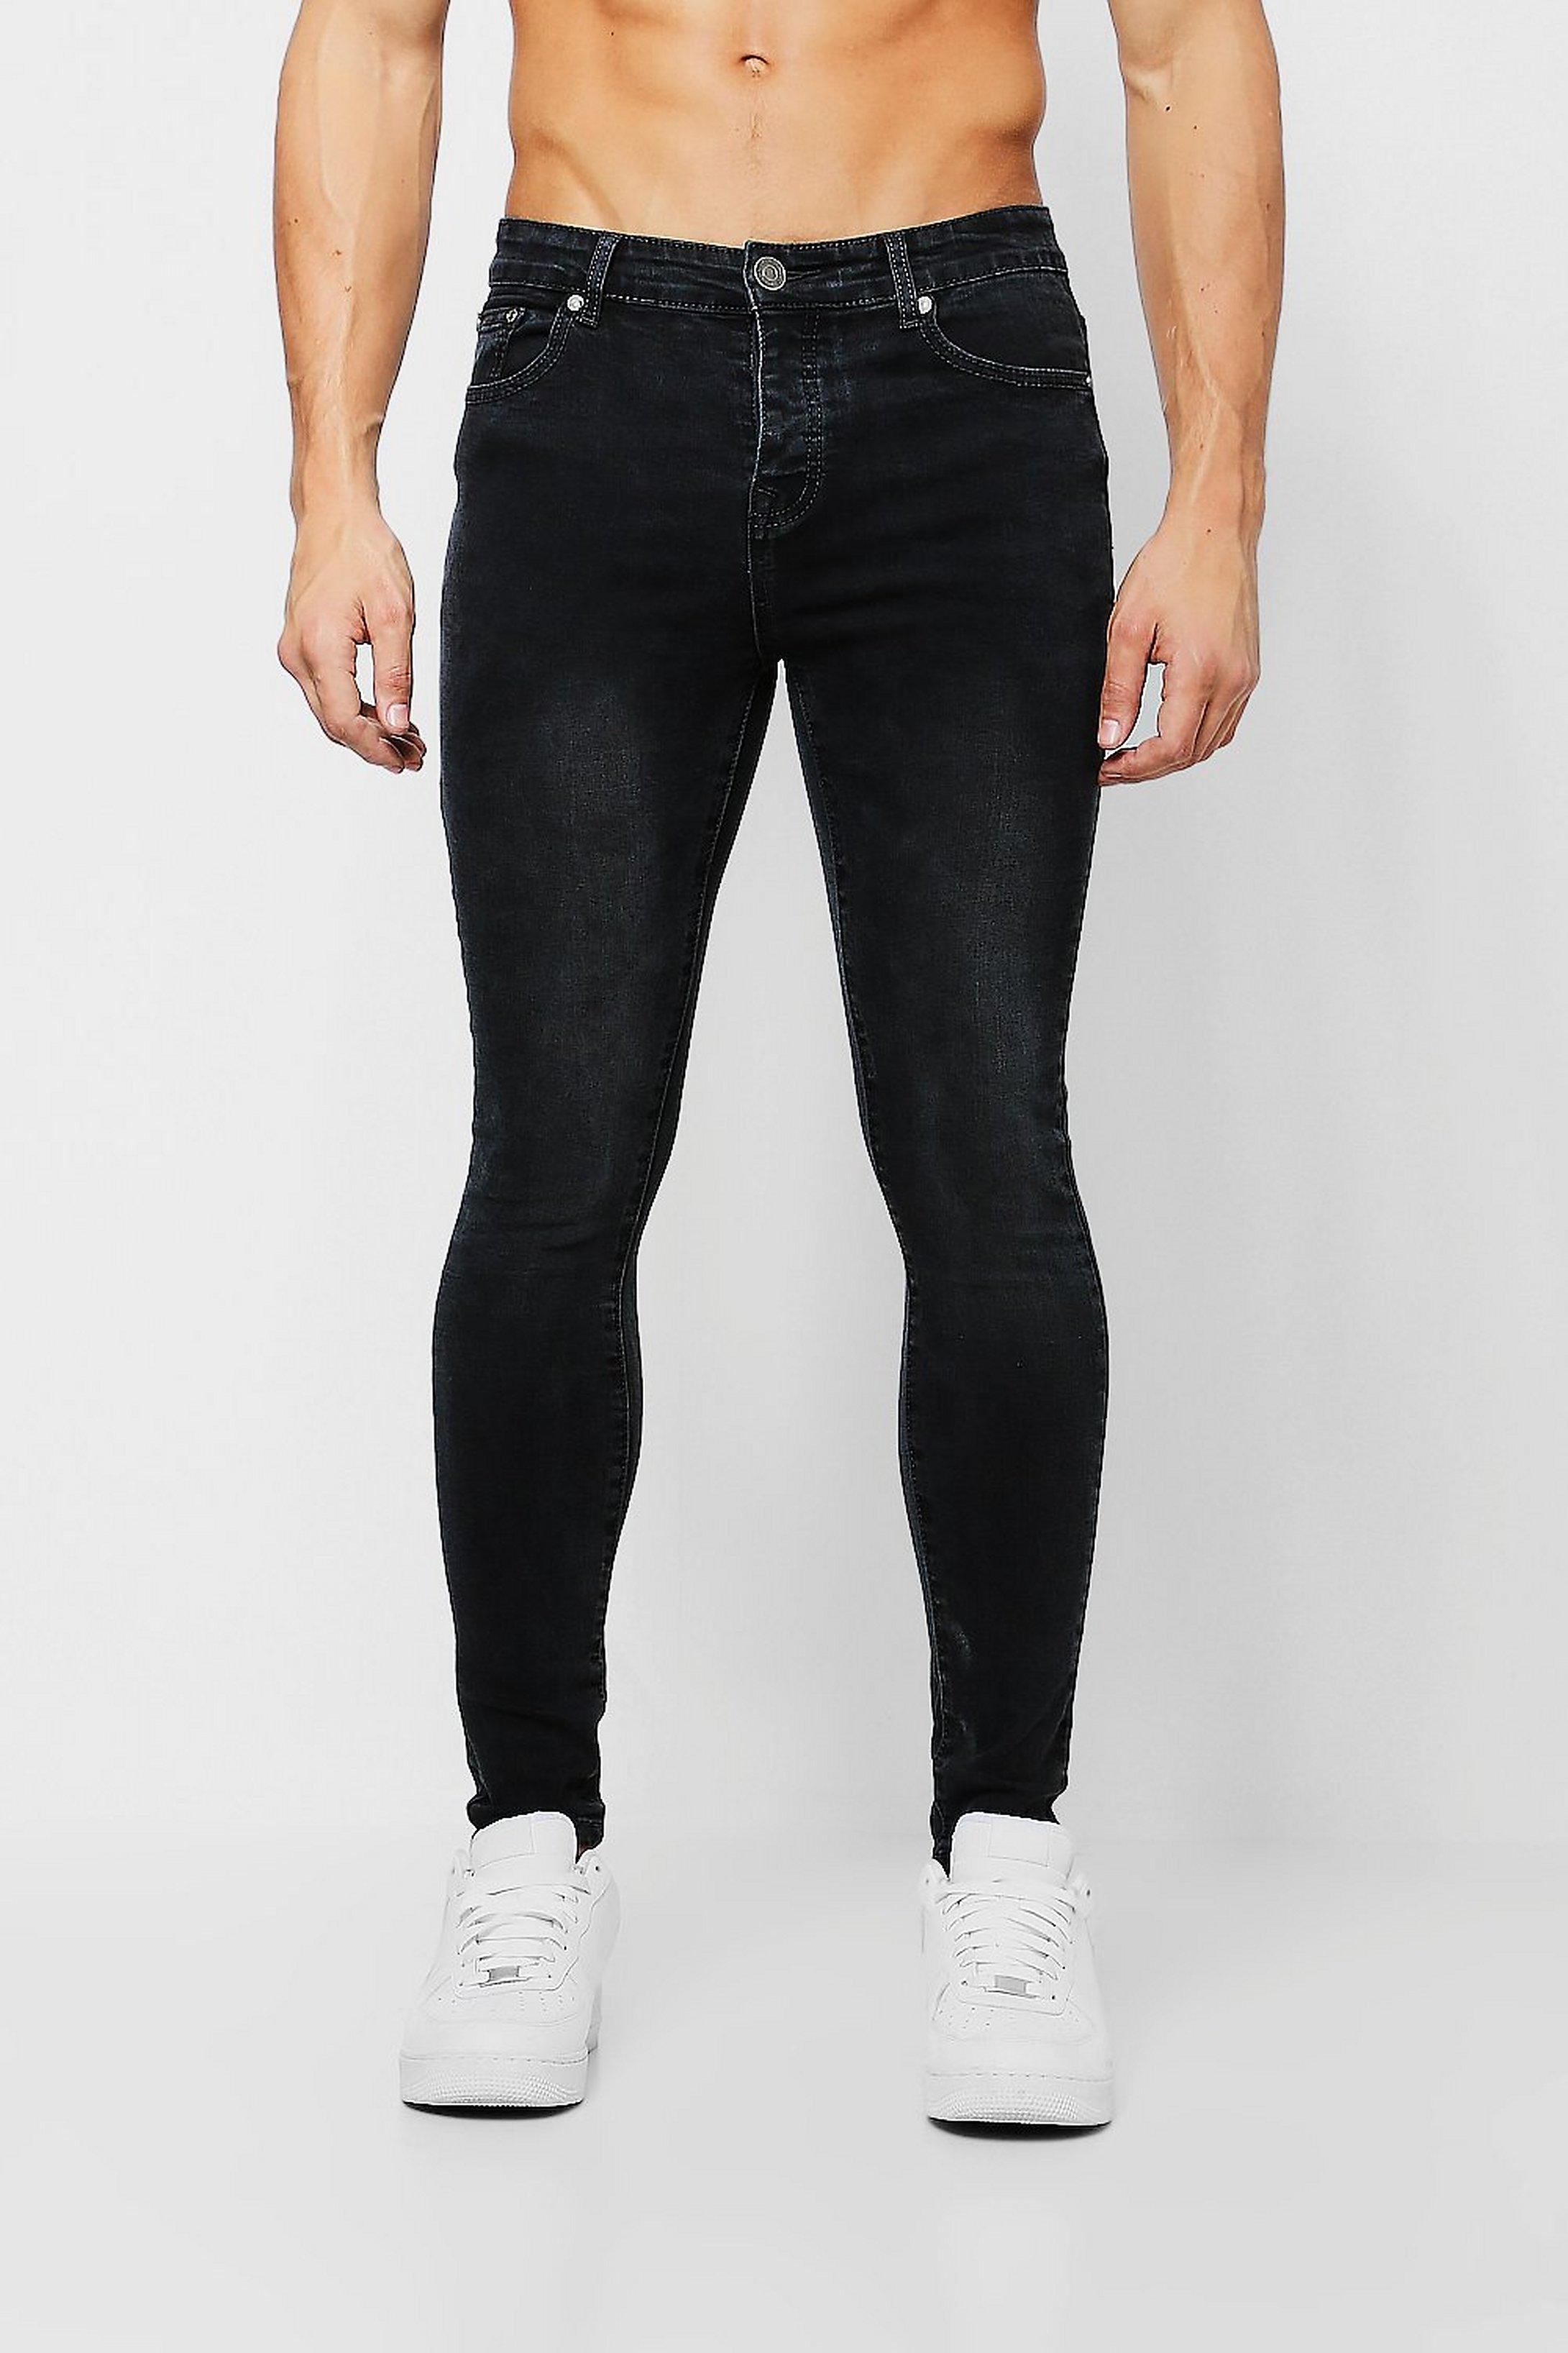 dcbfd9c96373b Spray On Skinny Jeans in schwarzer Waschung